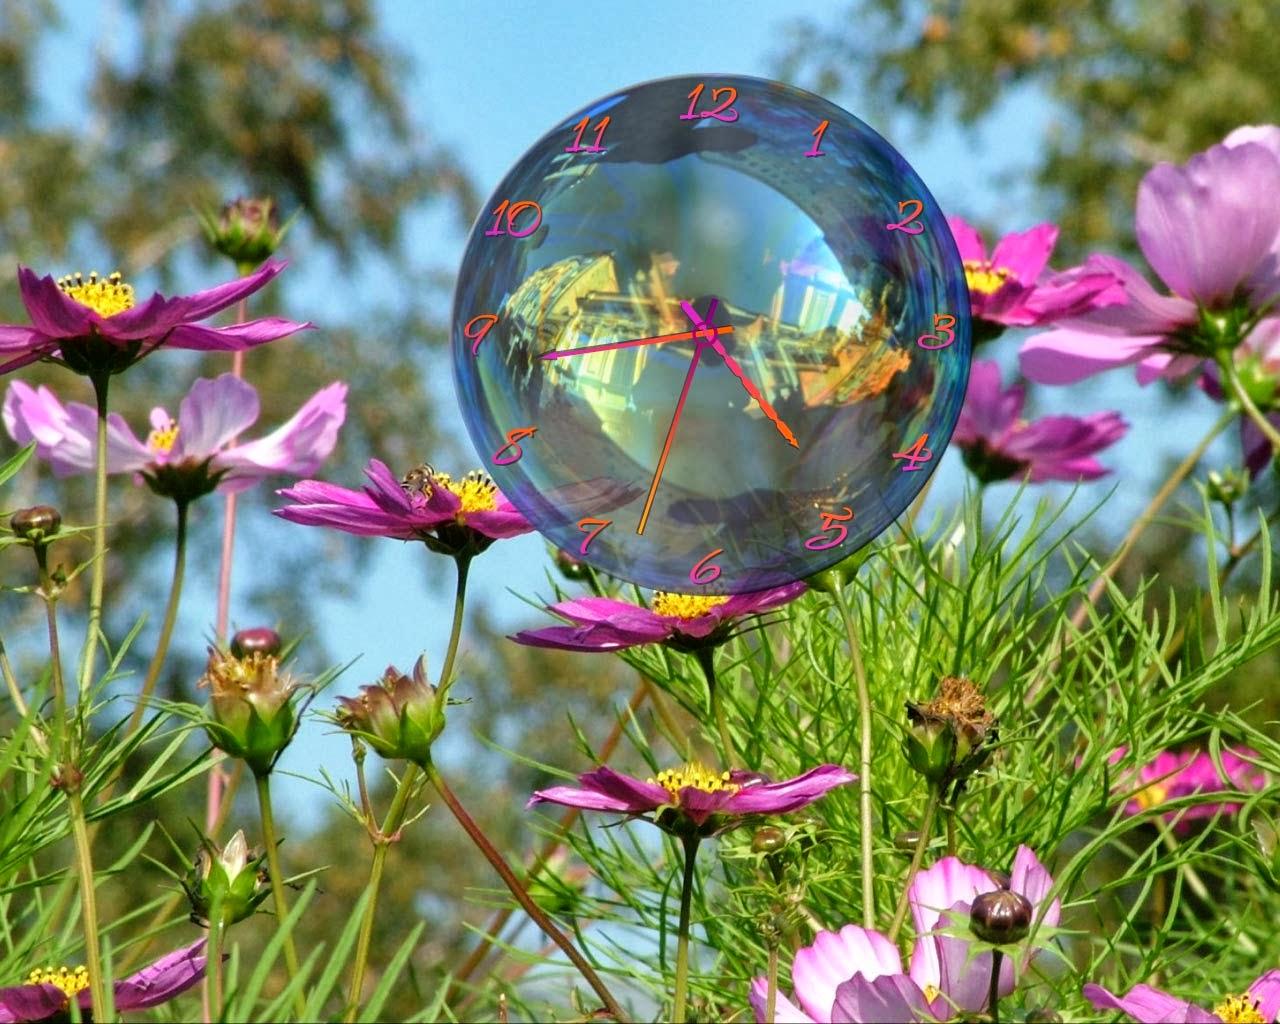 Ipad Wallpaper Little Plant In A Bubble: Garden: October 2013